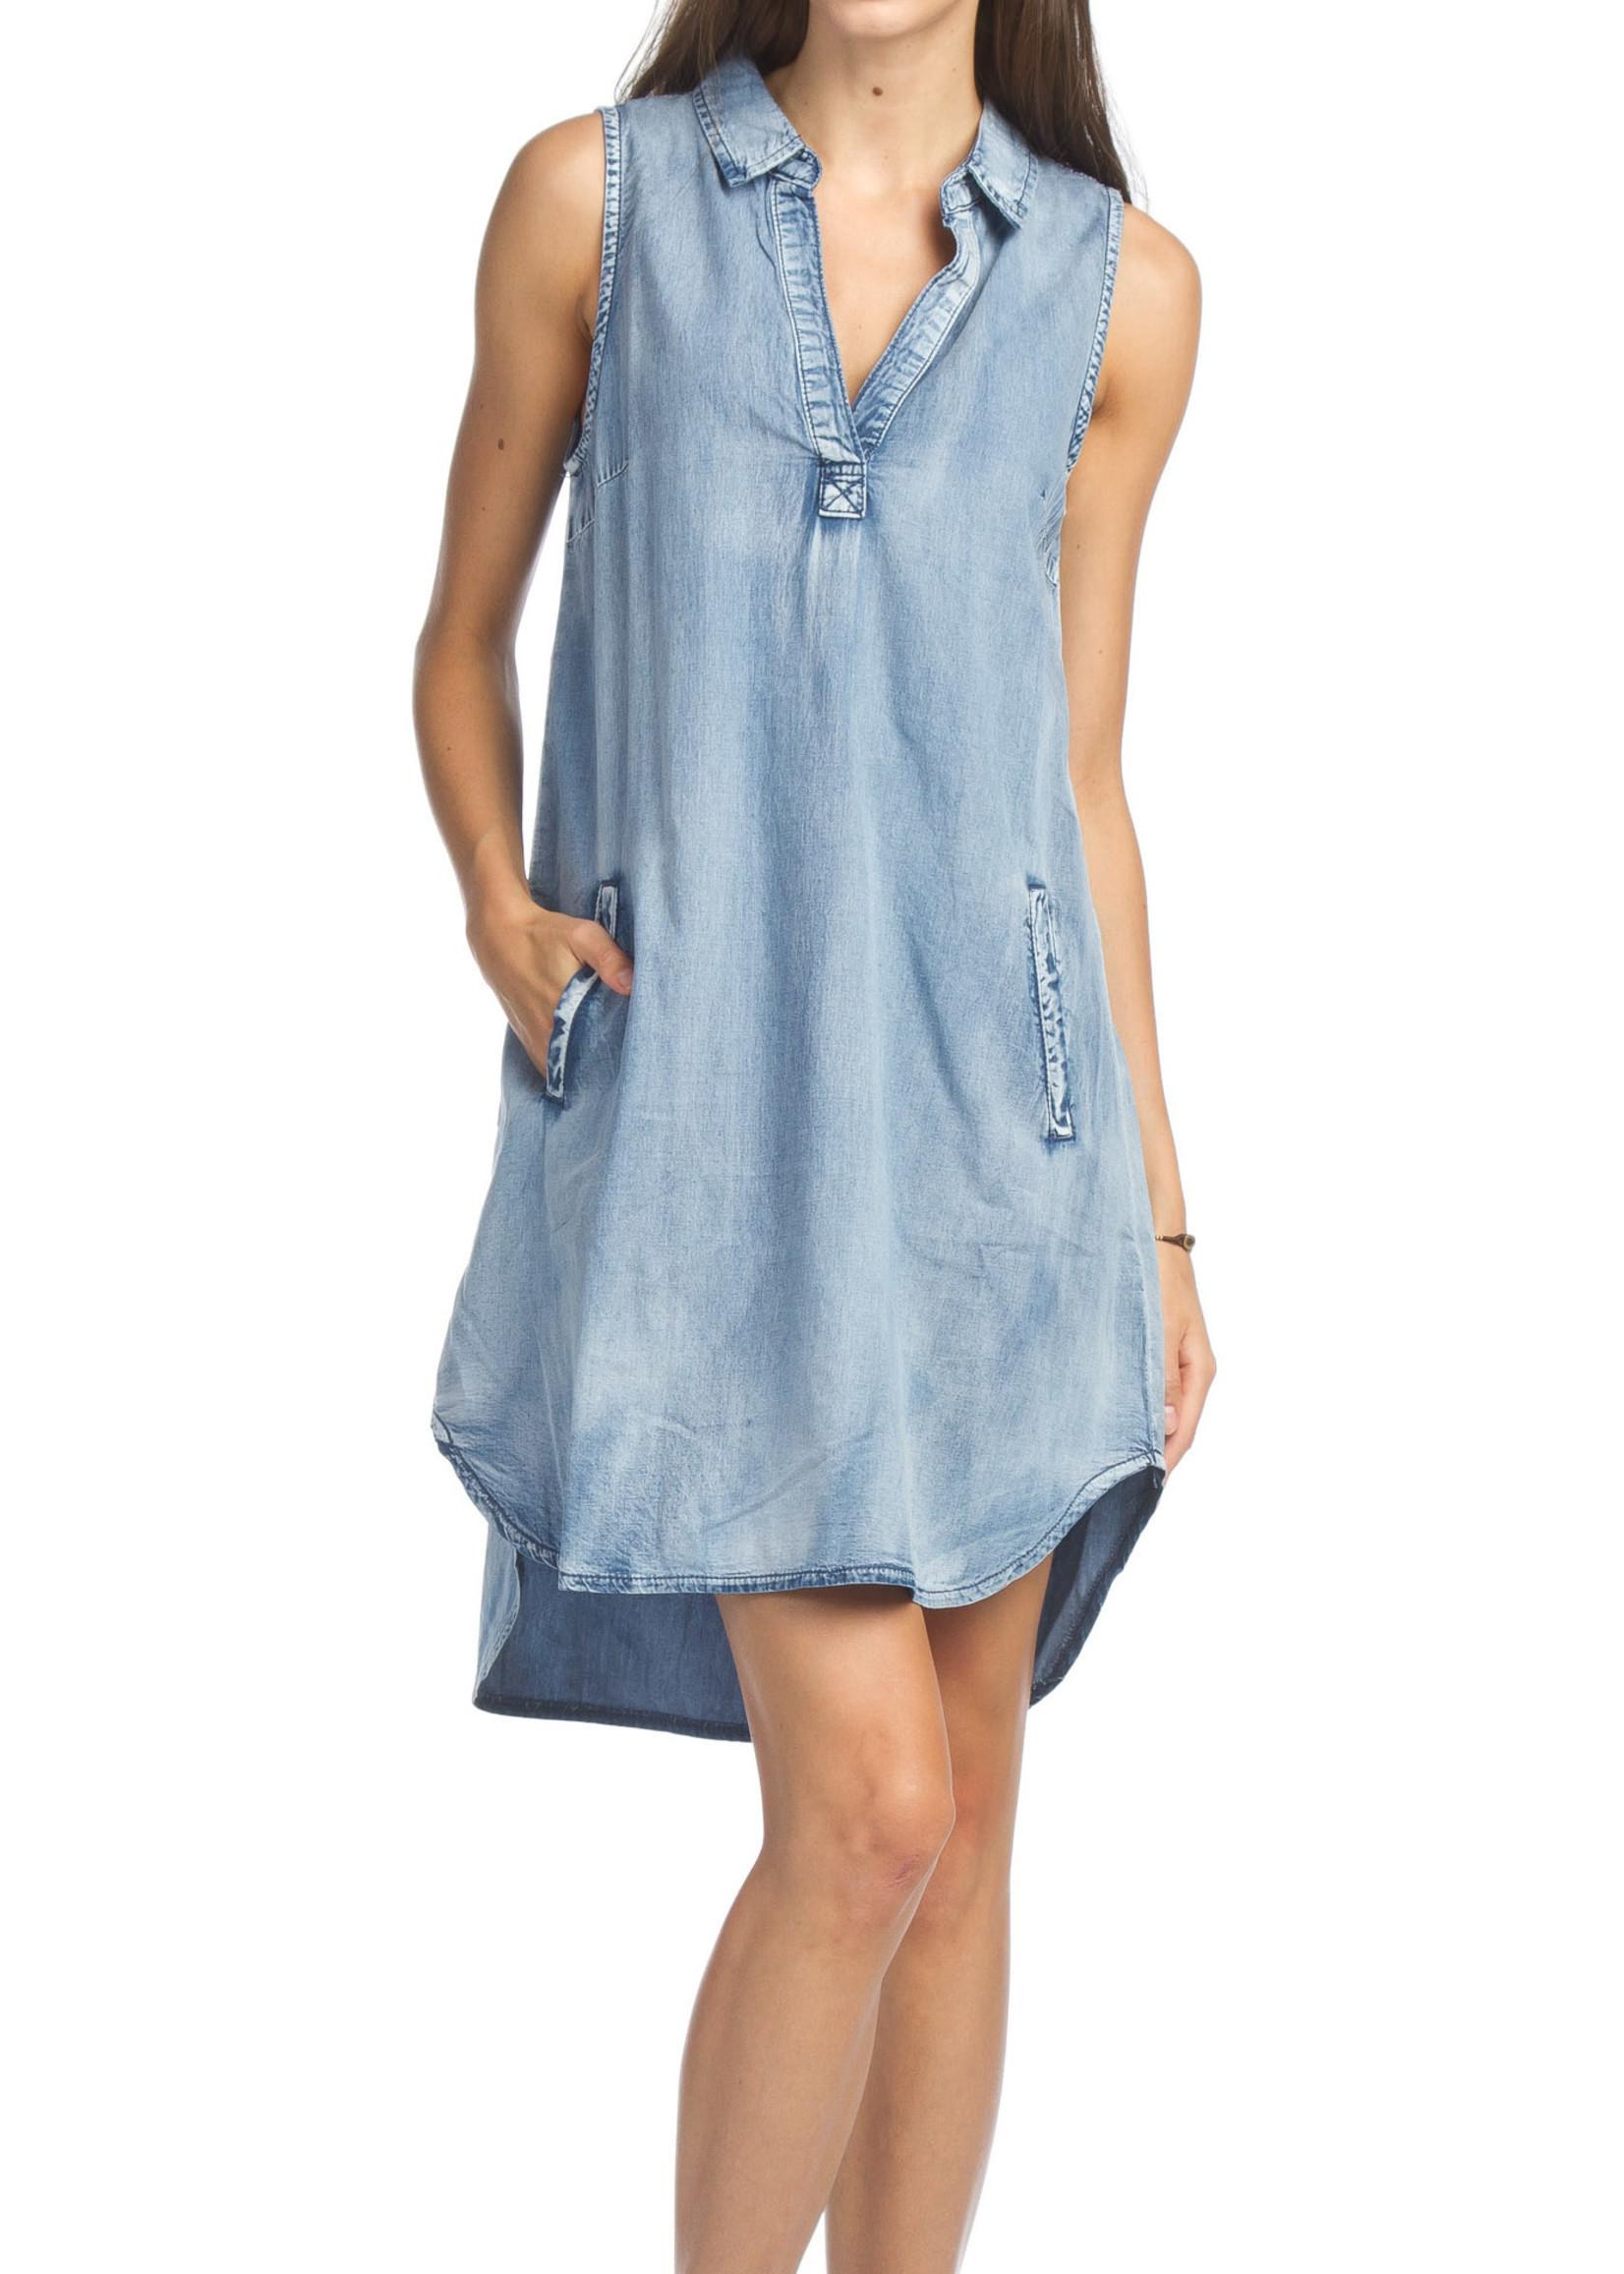 Papillon Eastern Imports Sleeveless Shirt Dress